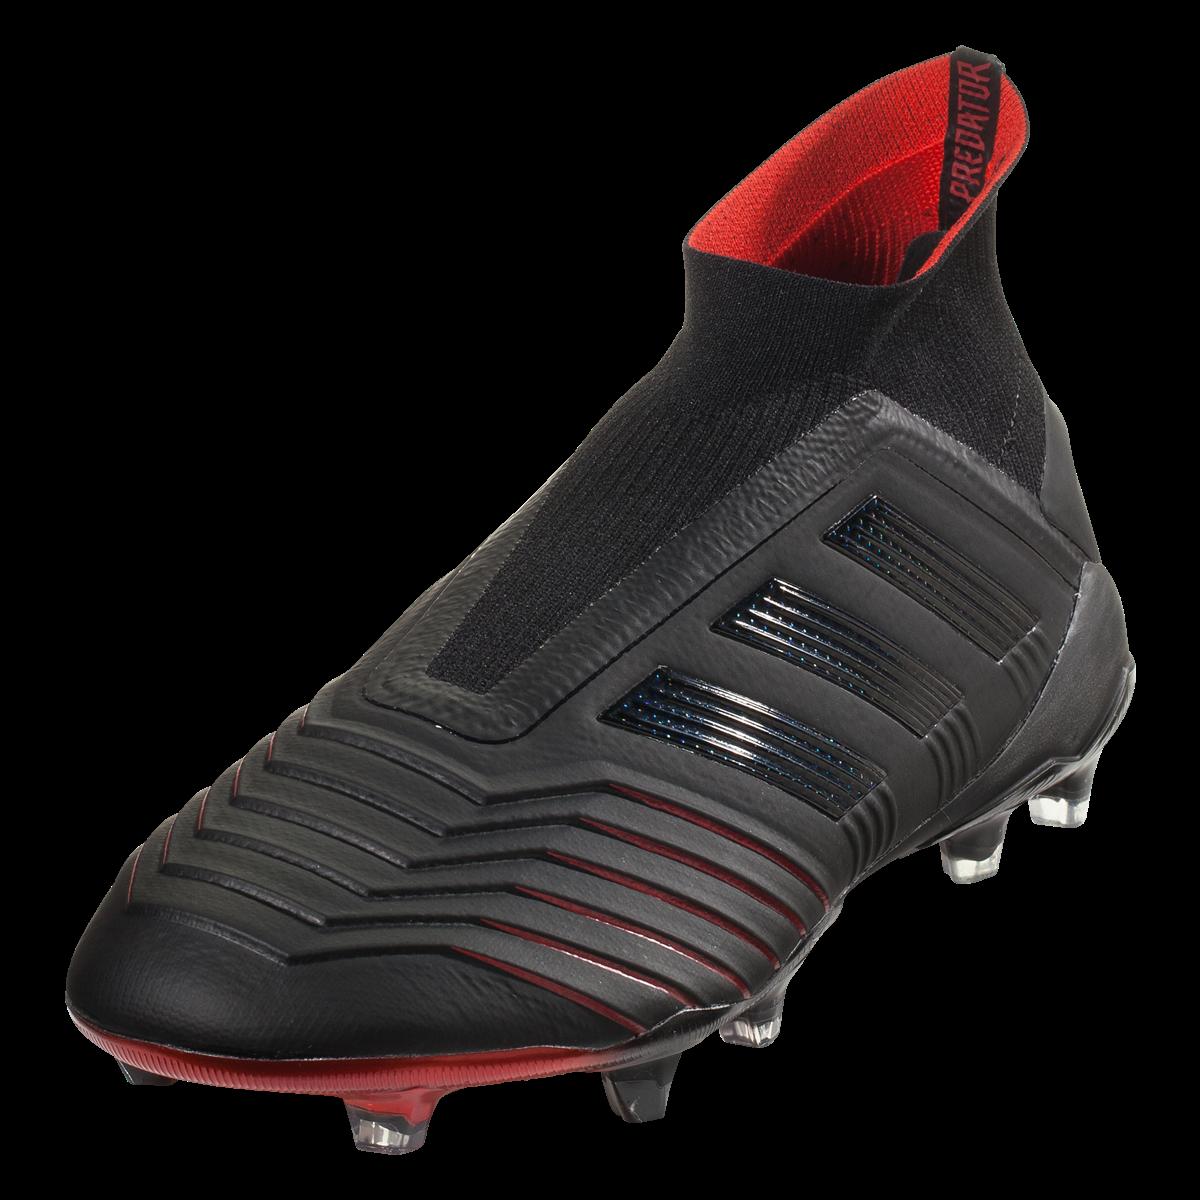 Adidas Predator 19 Fg Soccer Cleat Core Black Core Black Active Red 9 Adidas Predator Soccer Cleats Cleats